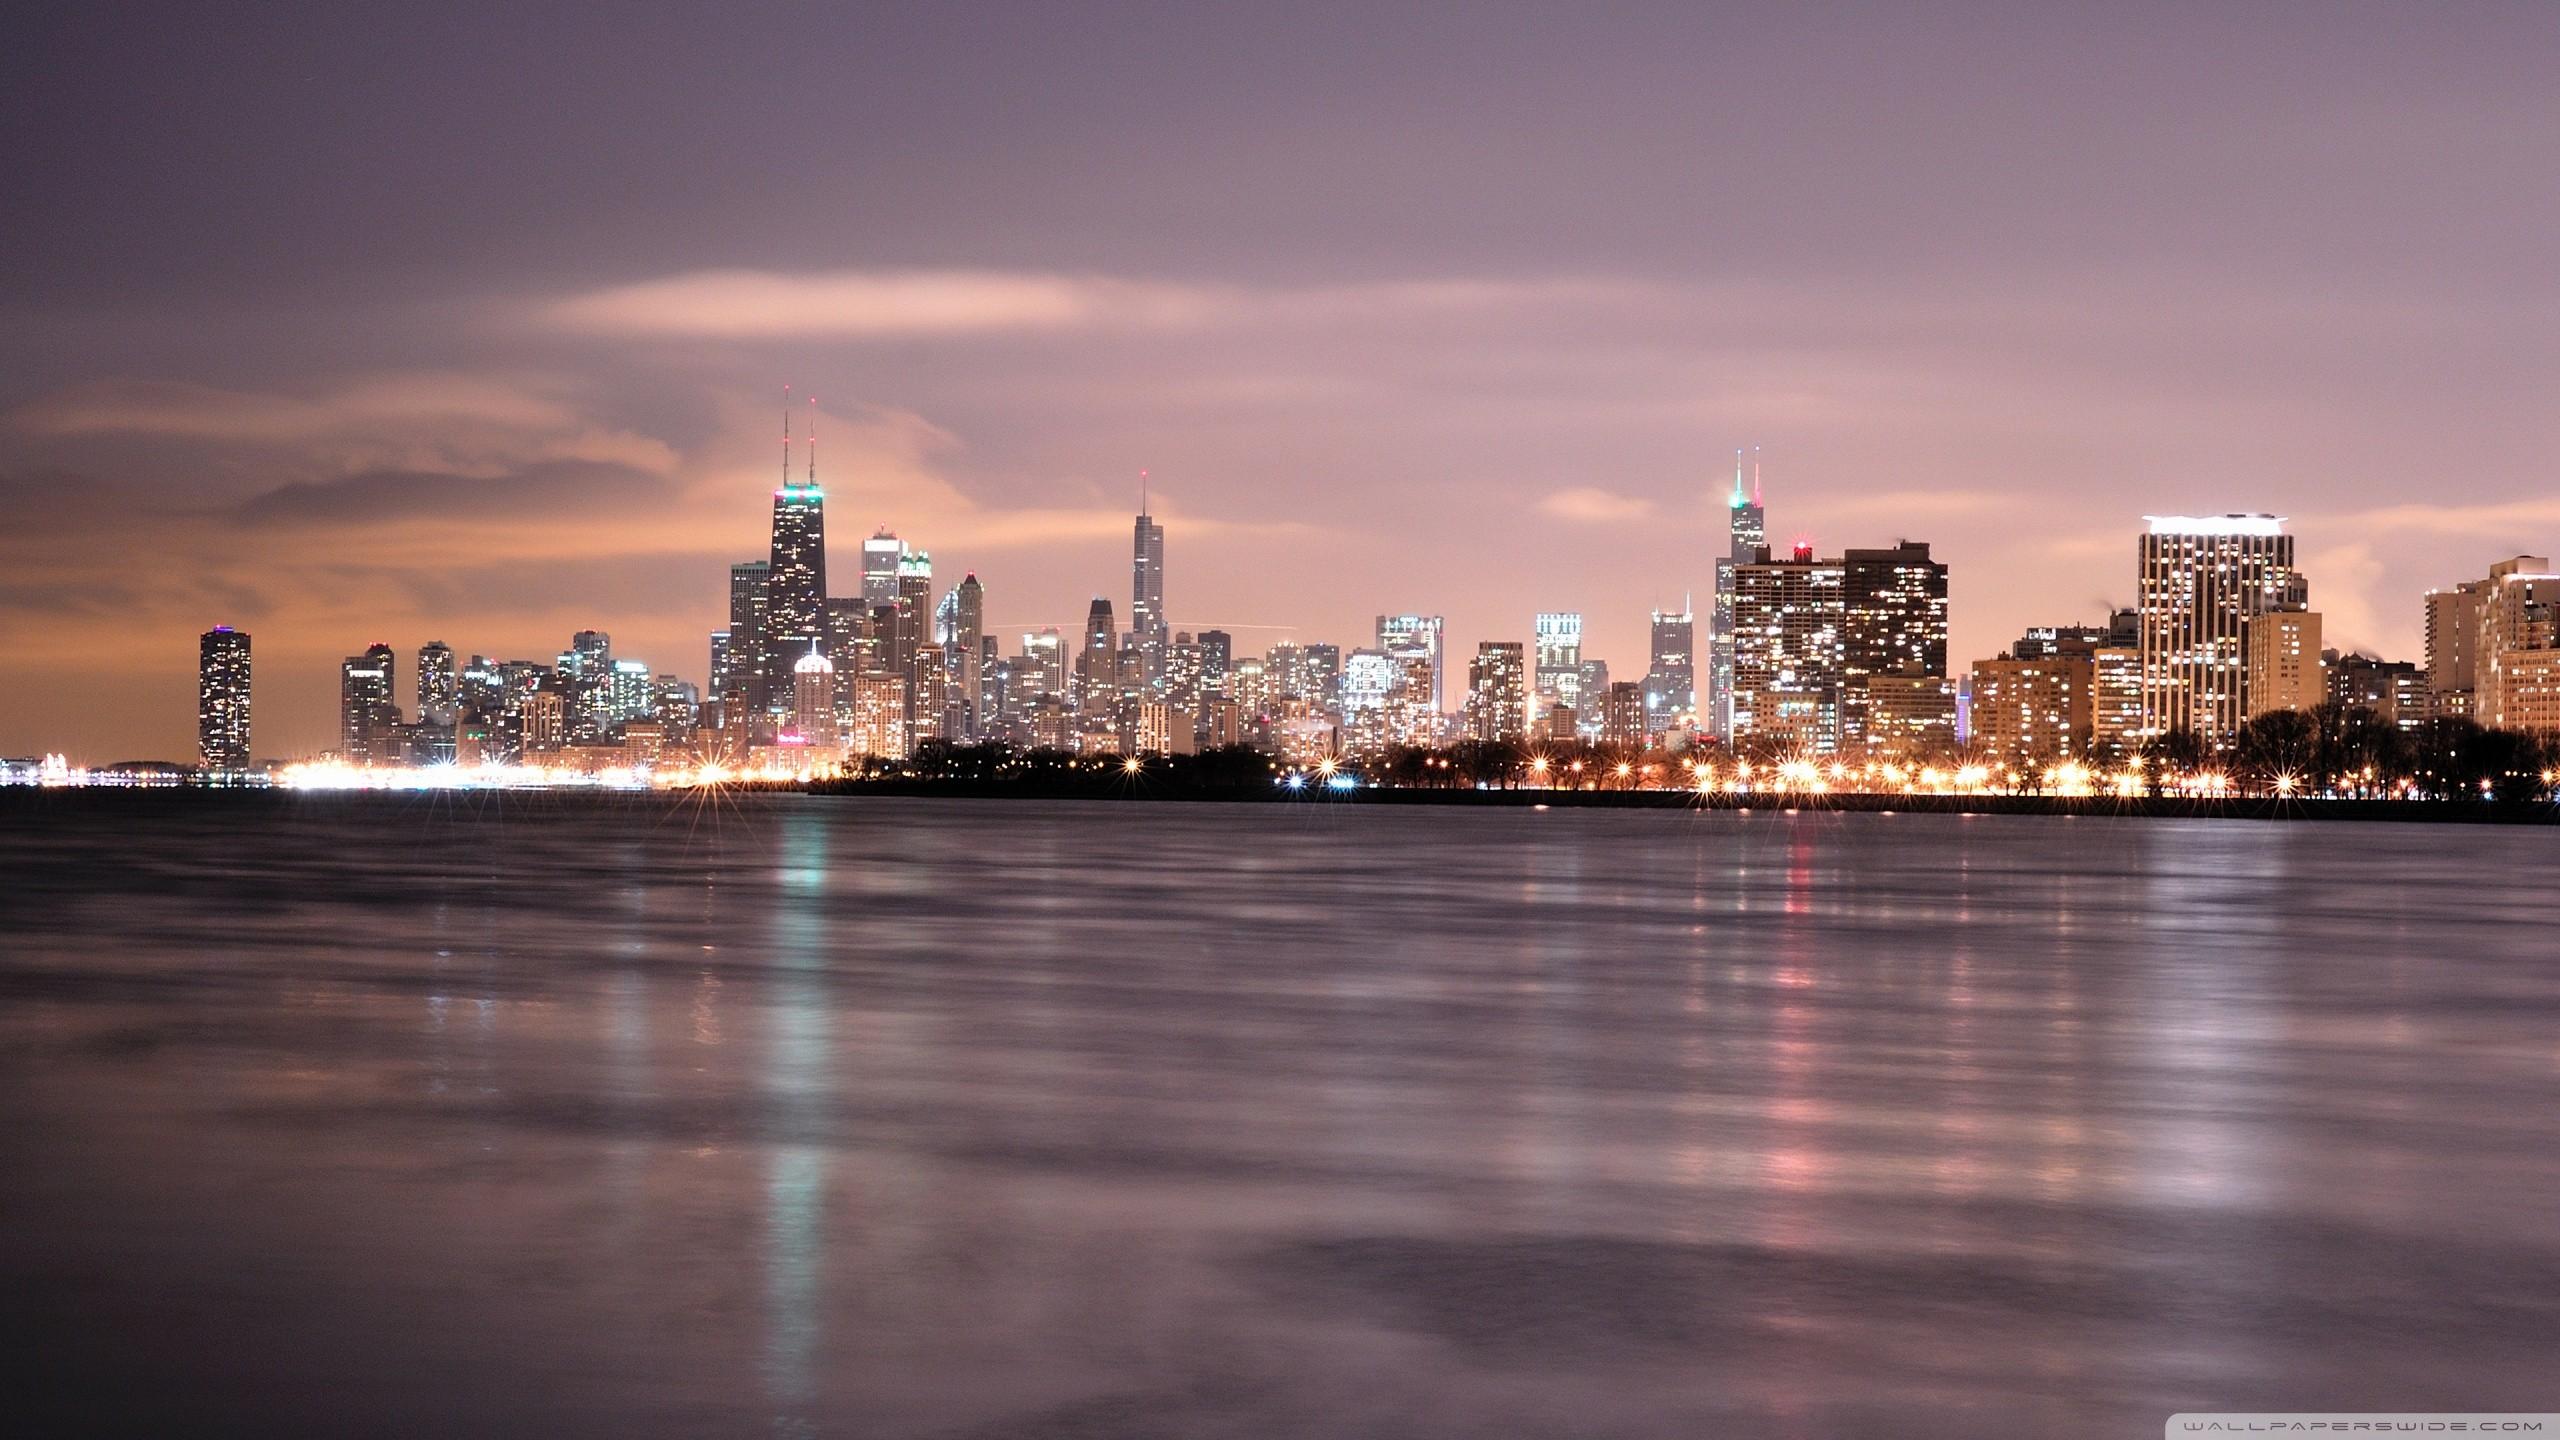 High Resolution Chicago Skyline Wallpaper 64 Images